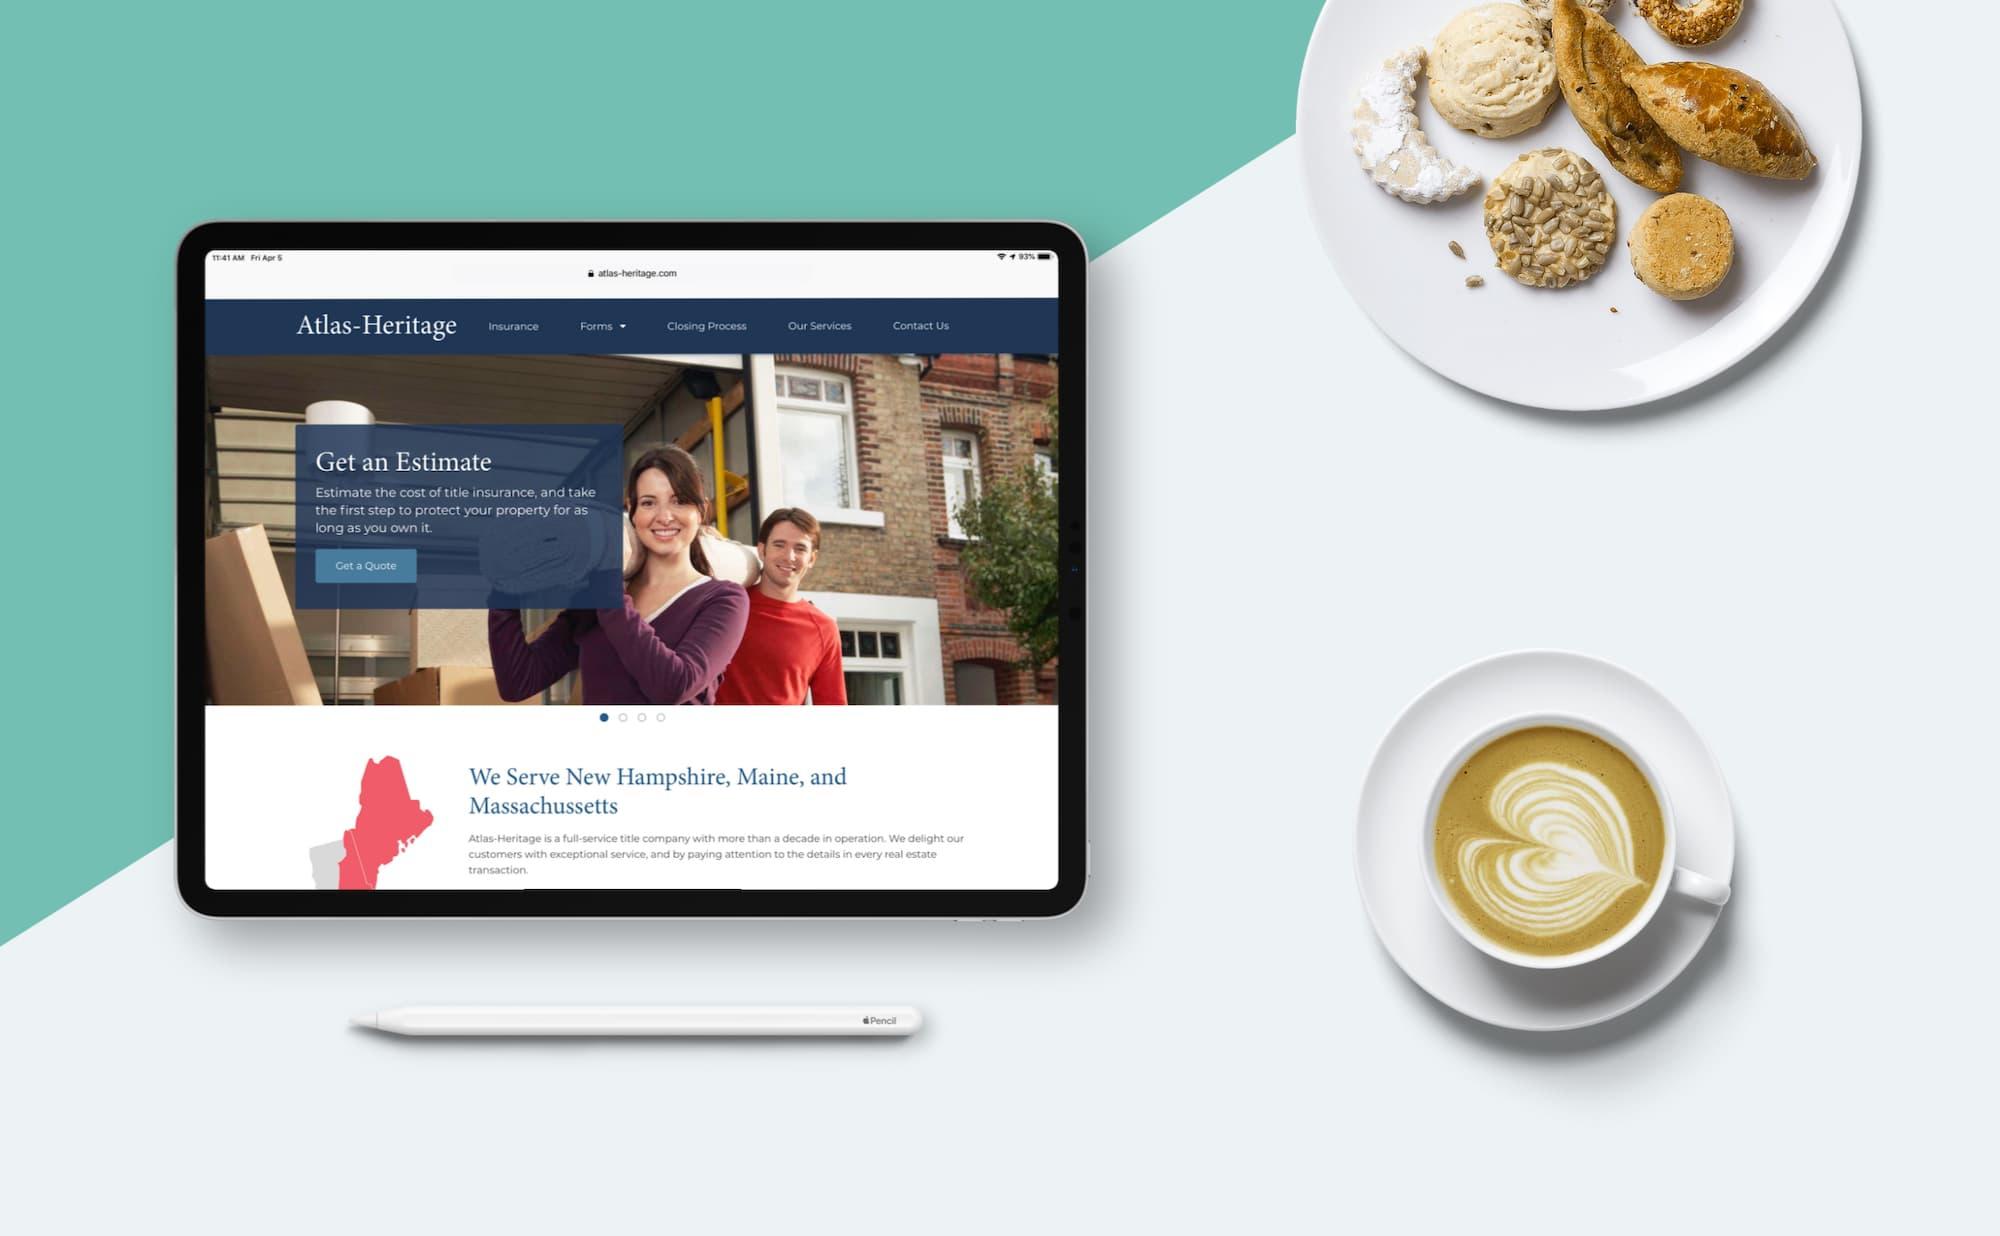 Atlas-Heritage website as seen on an iPad Pro